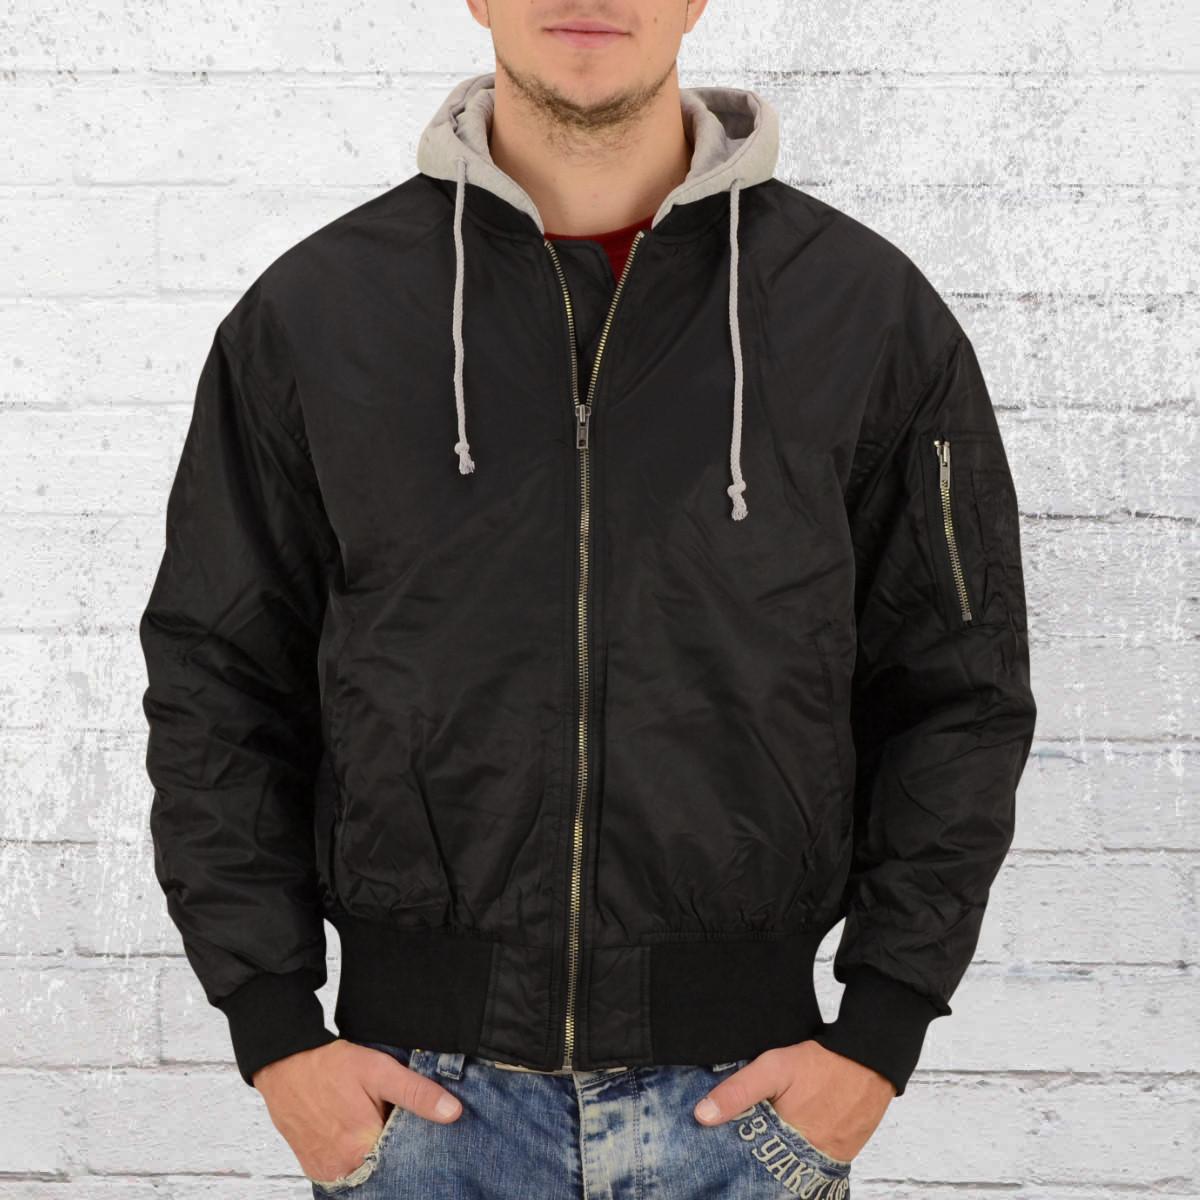 Urban Classics Hooded Oversized Bomber Jacket black. ›‹ « 3364829a1e6